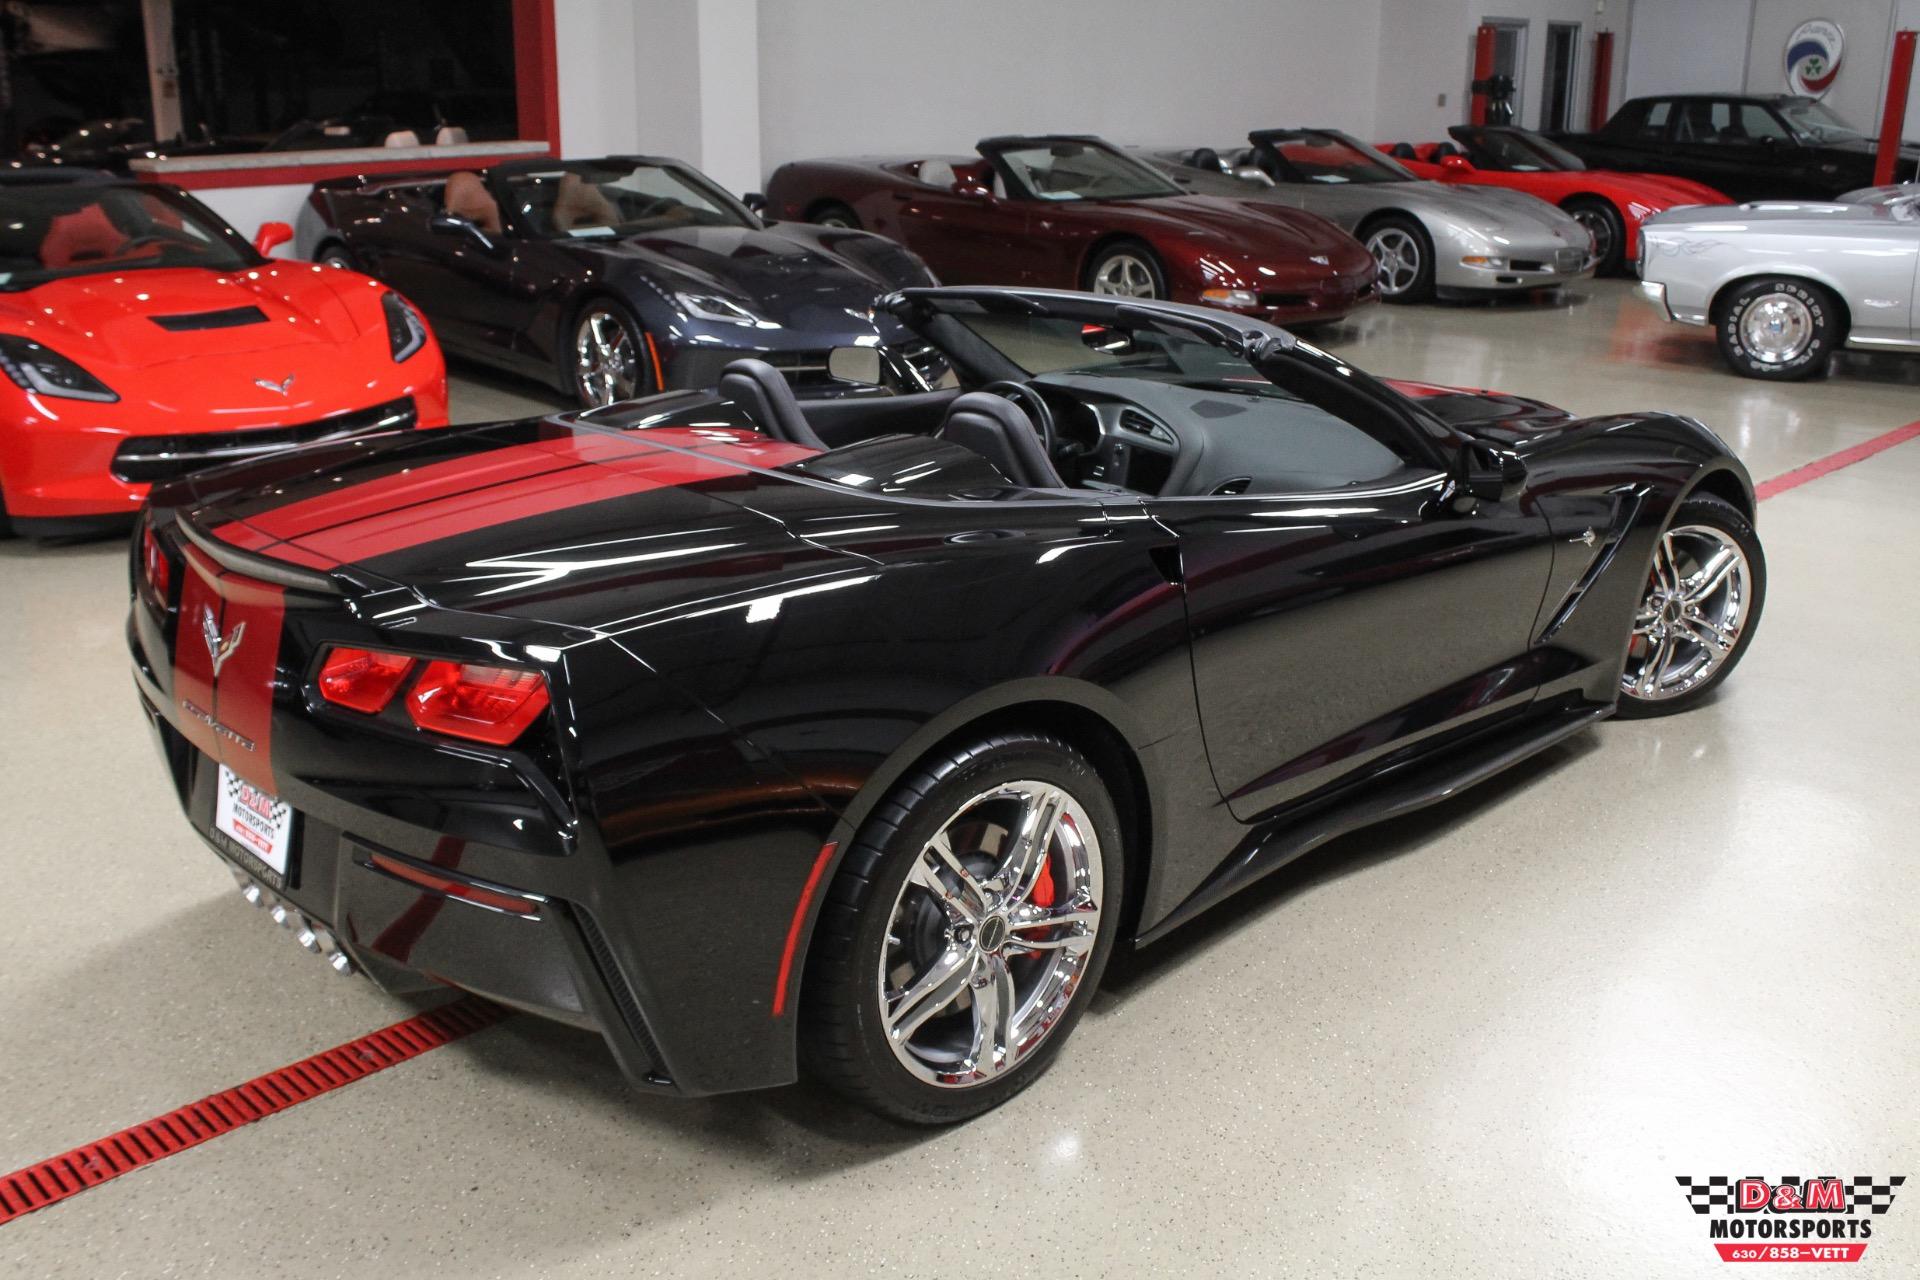 2016 Chevrolet Corvette Stingray Convertible Stock M6612 for sale